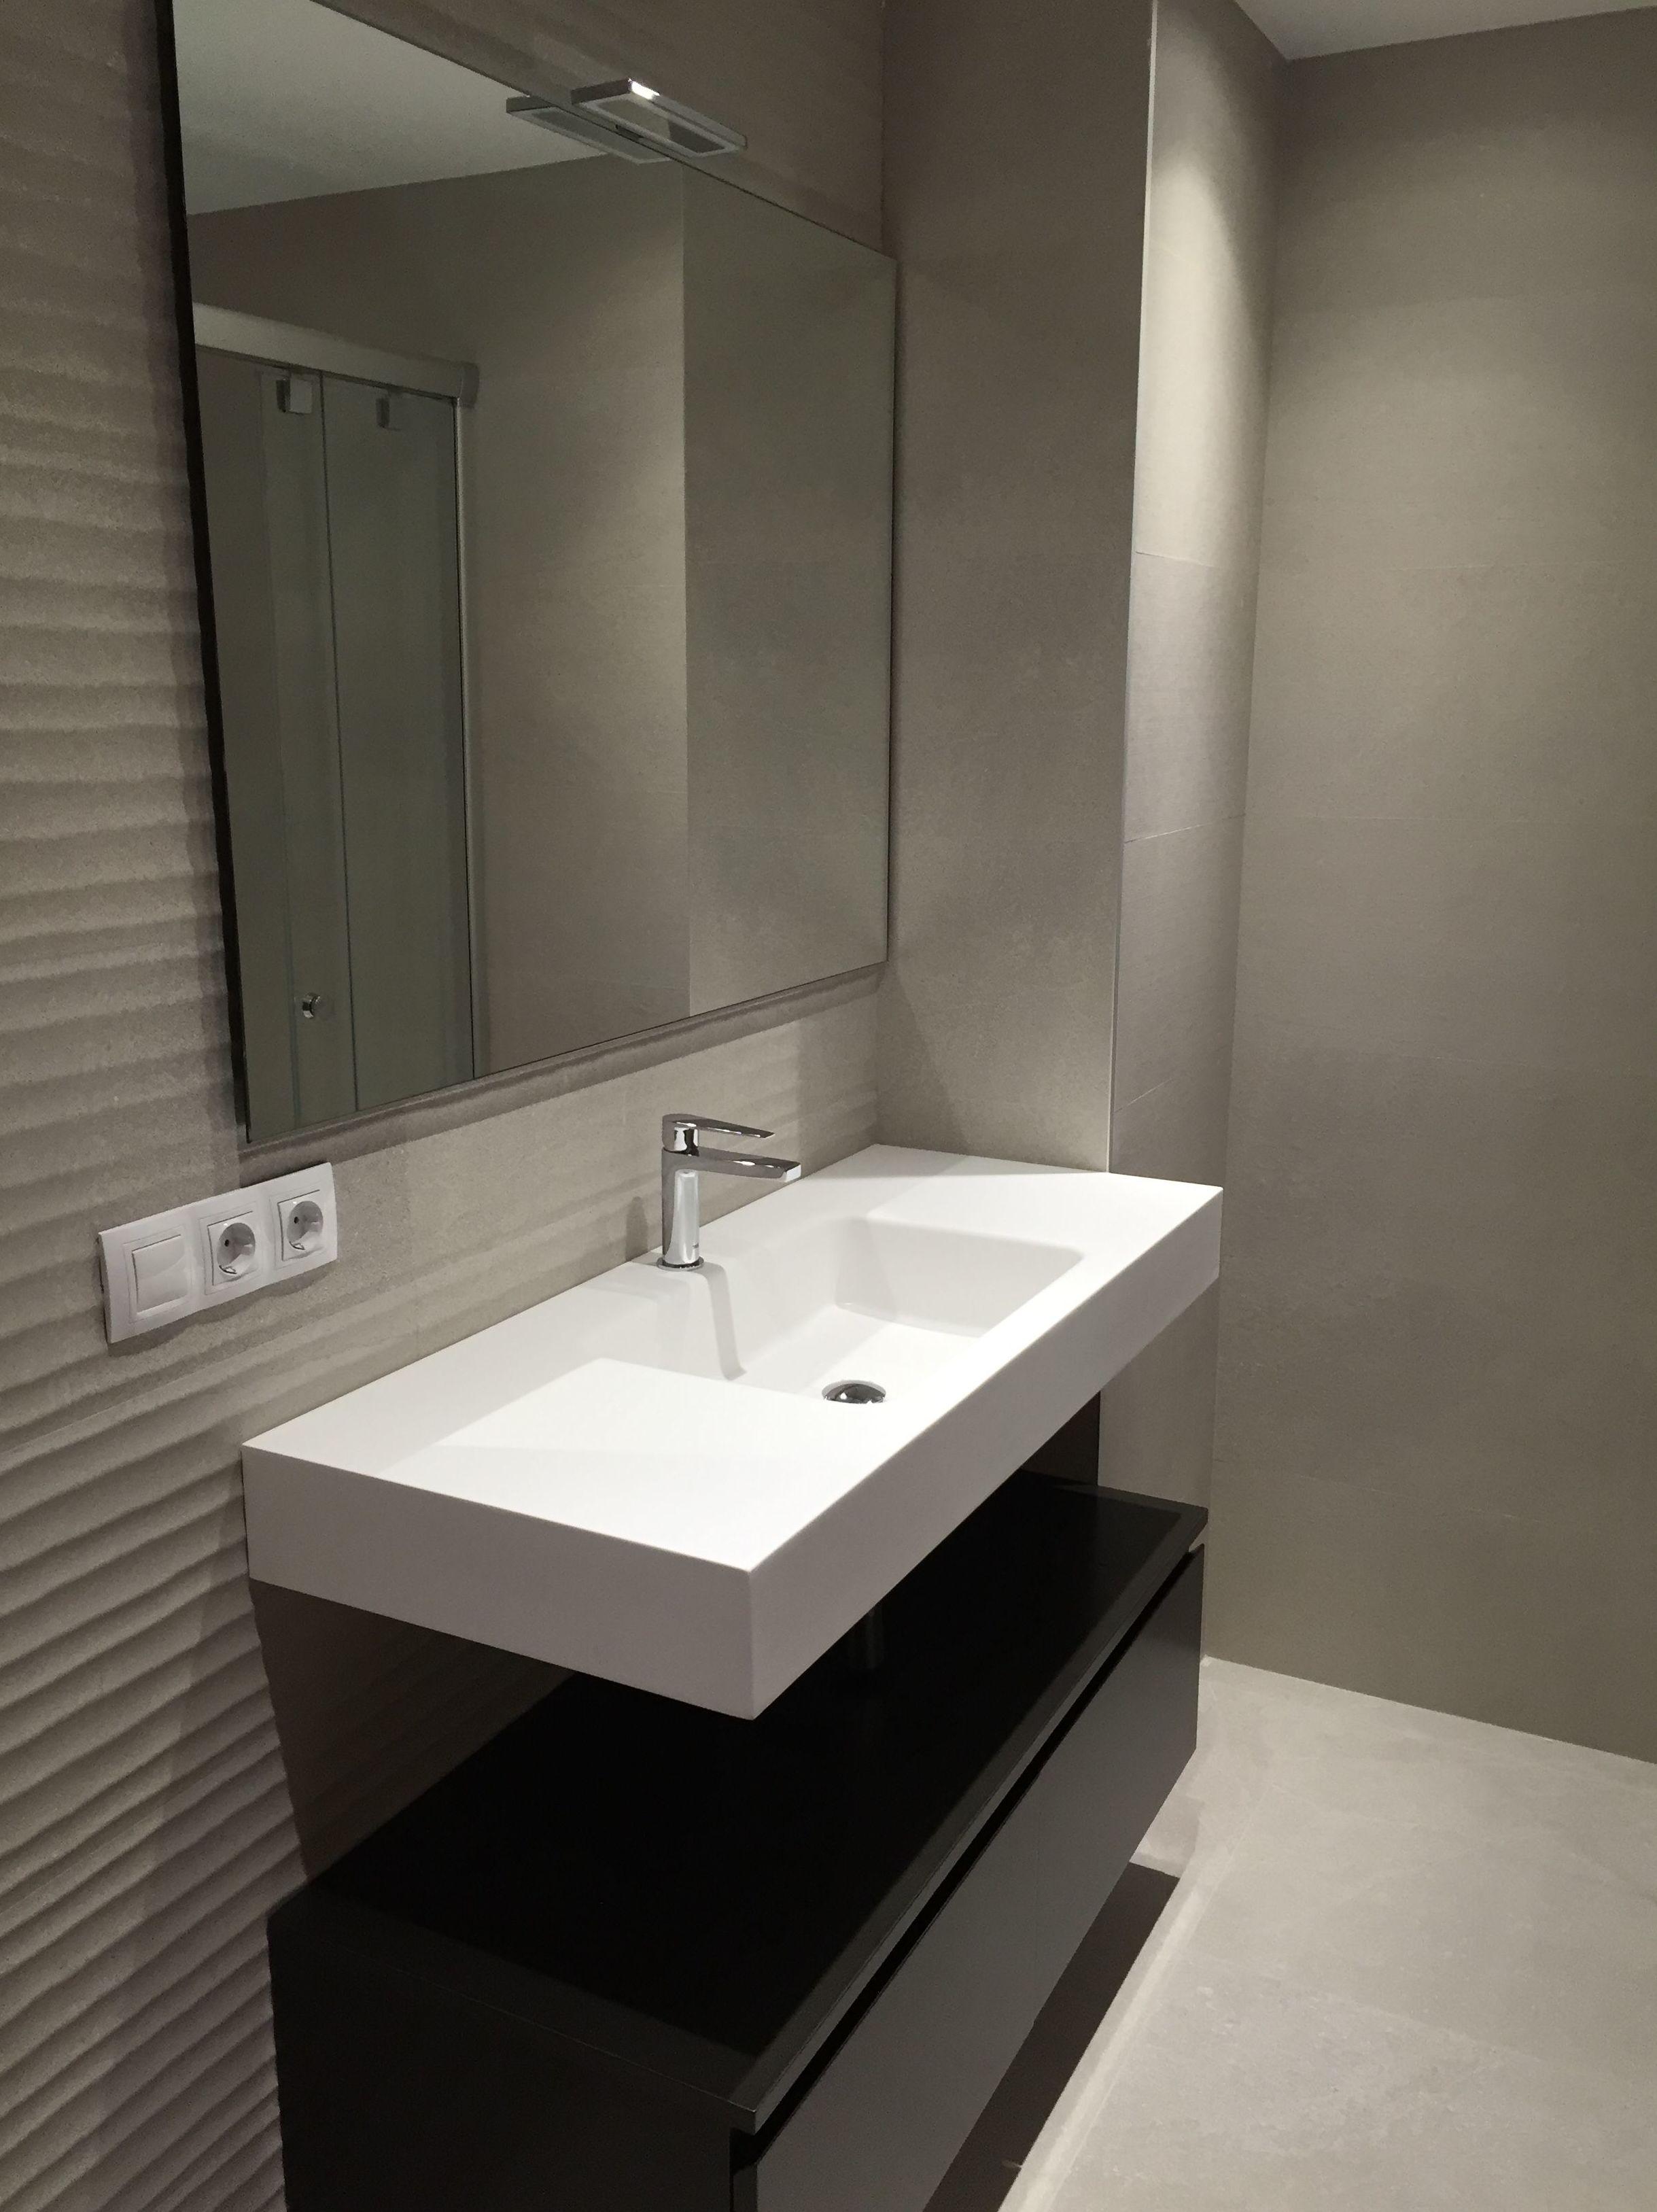 Mueble baño lavabo suspendido